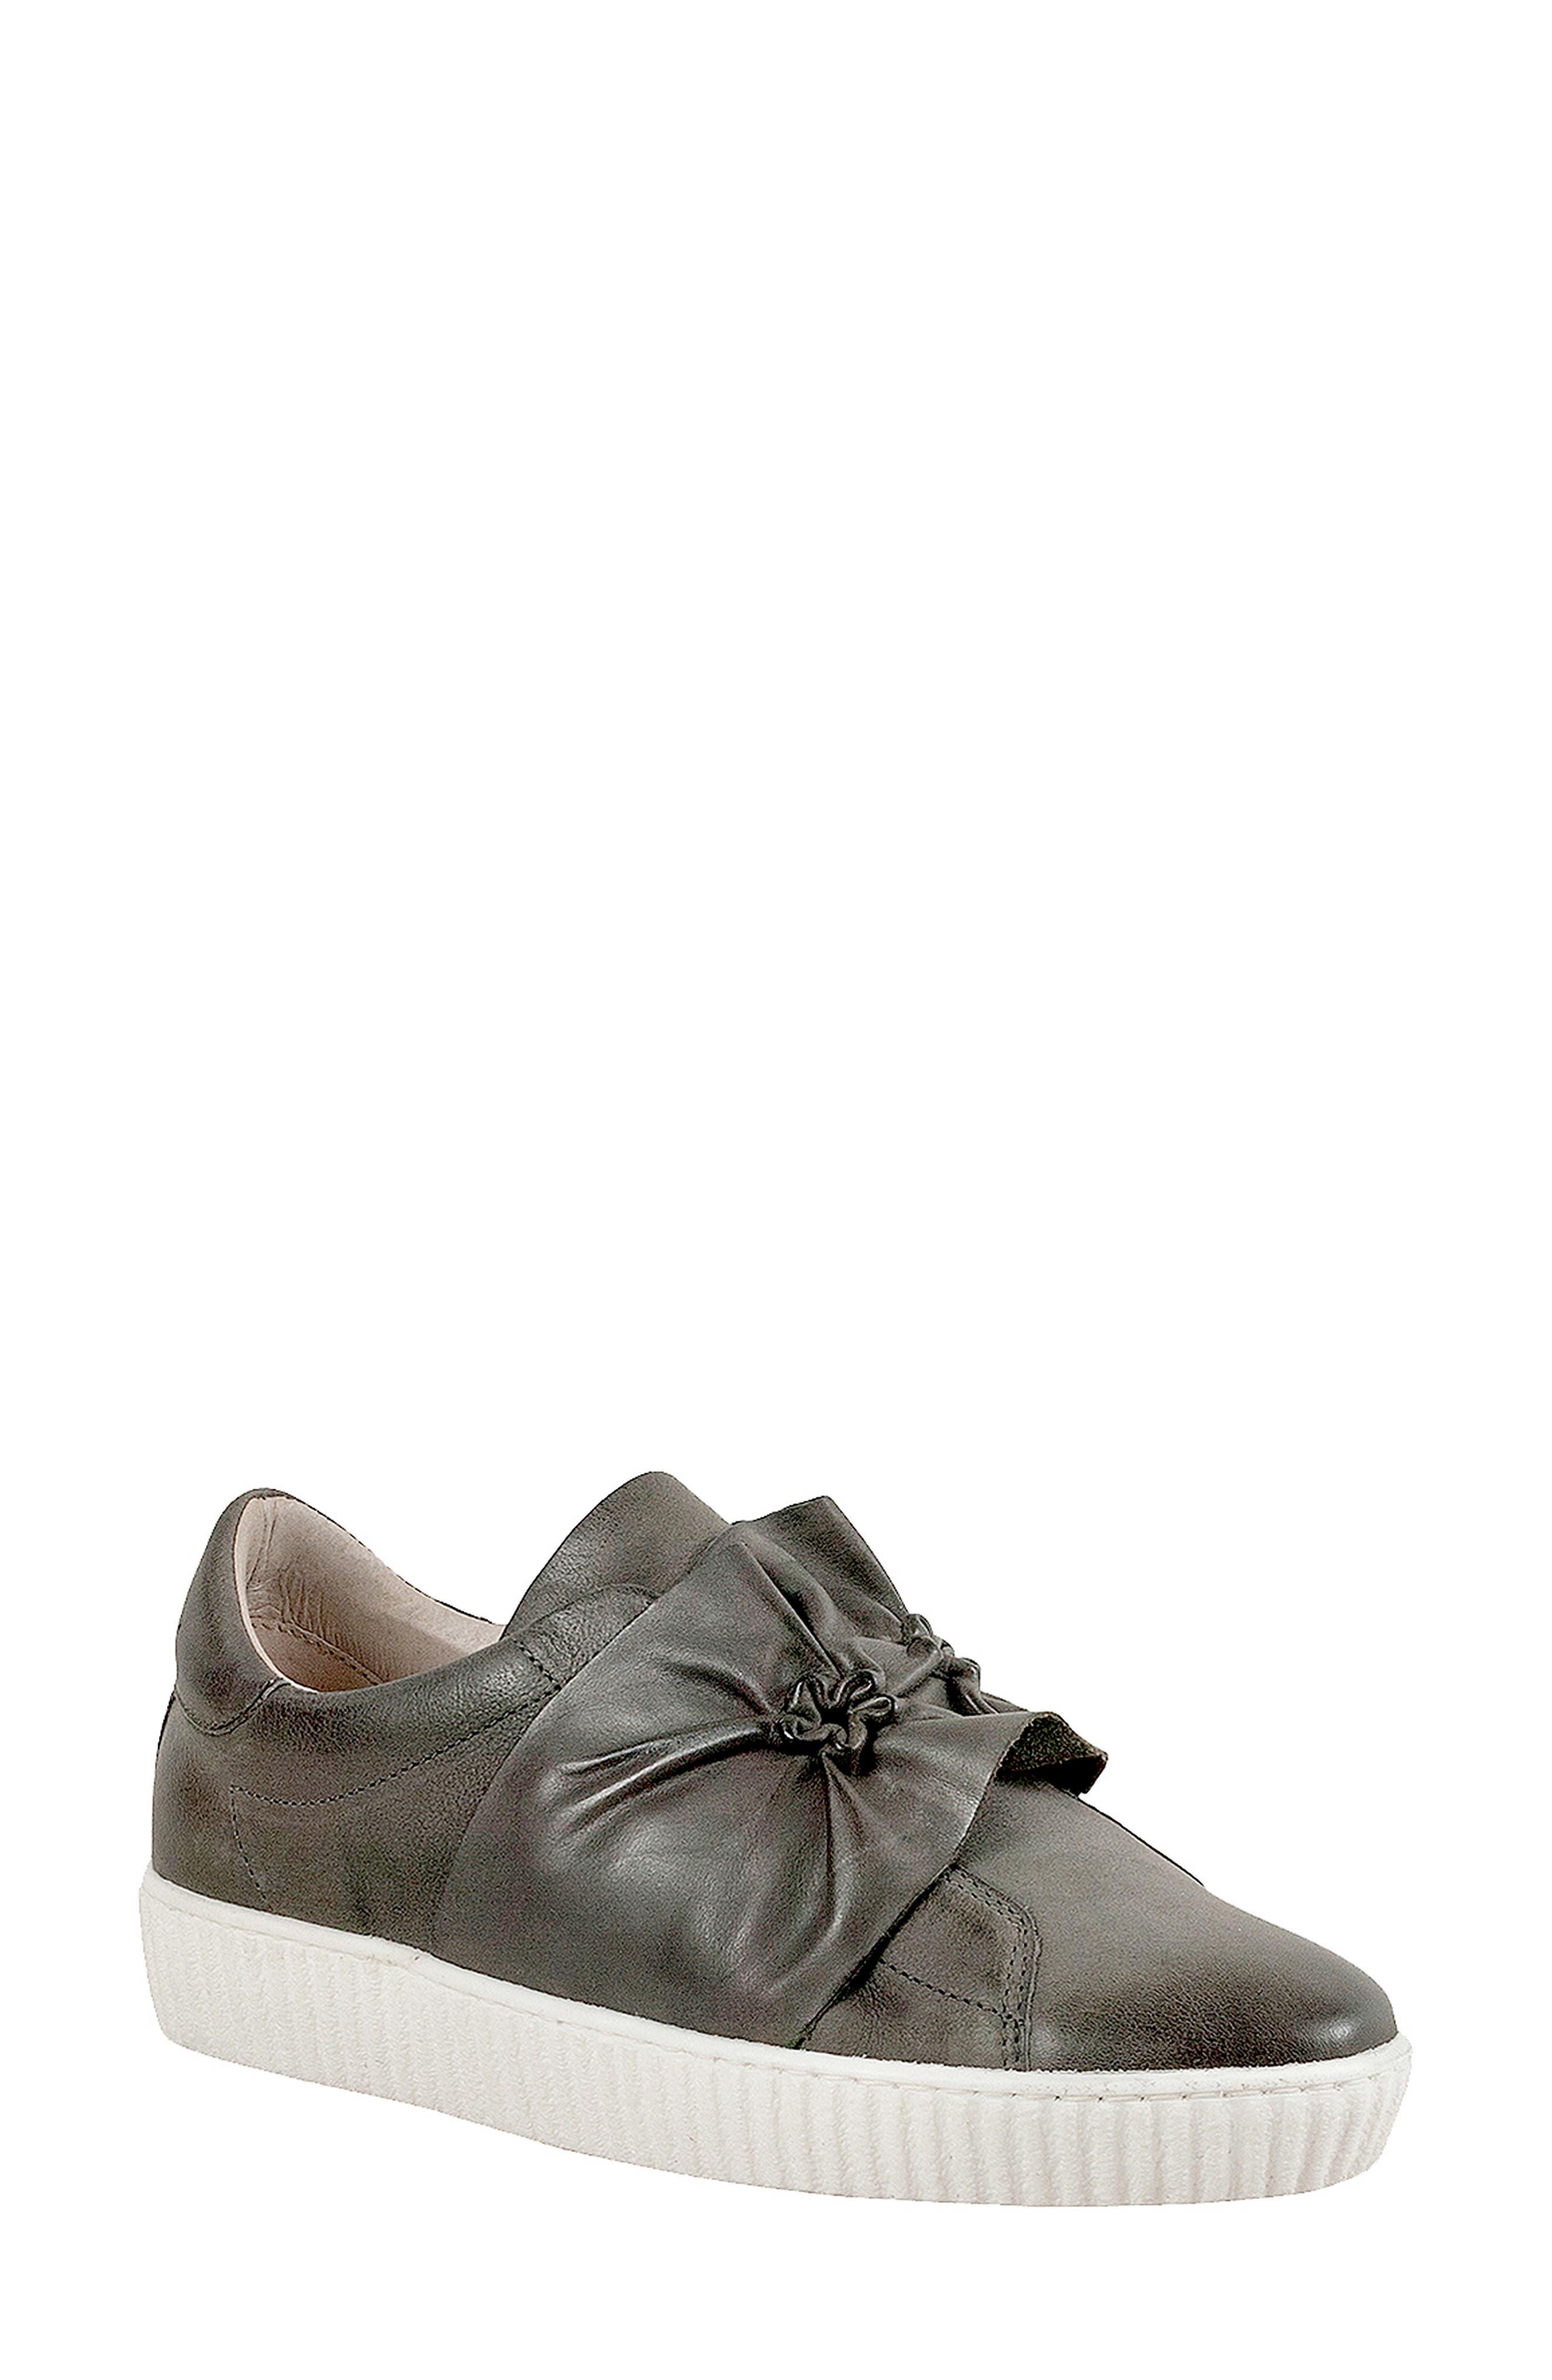 Miz Mooz Orbit Slip-On Sneaker, Grey